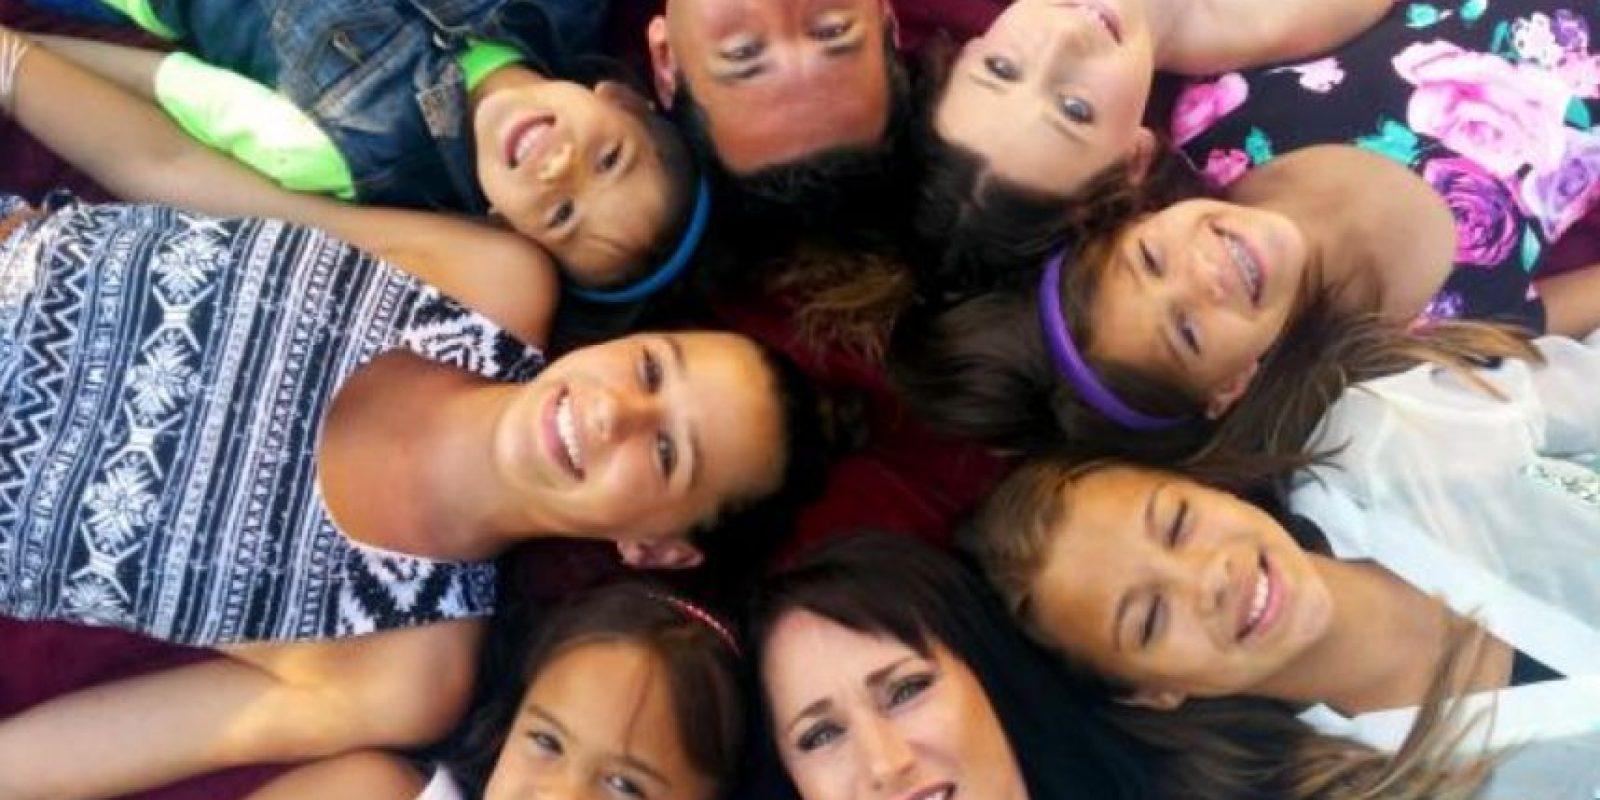 Así luce la actual familia de 8 integrantes. Foto:Vía youcaring.com